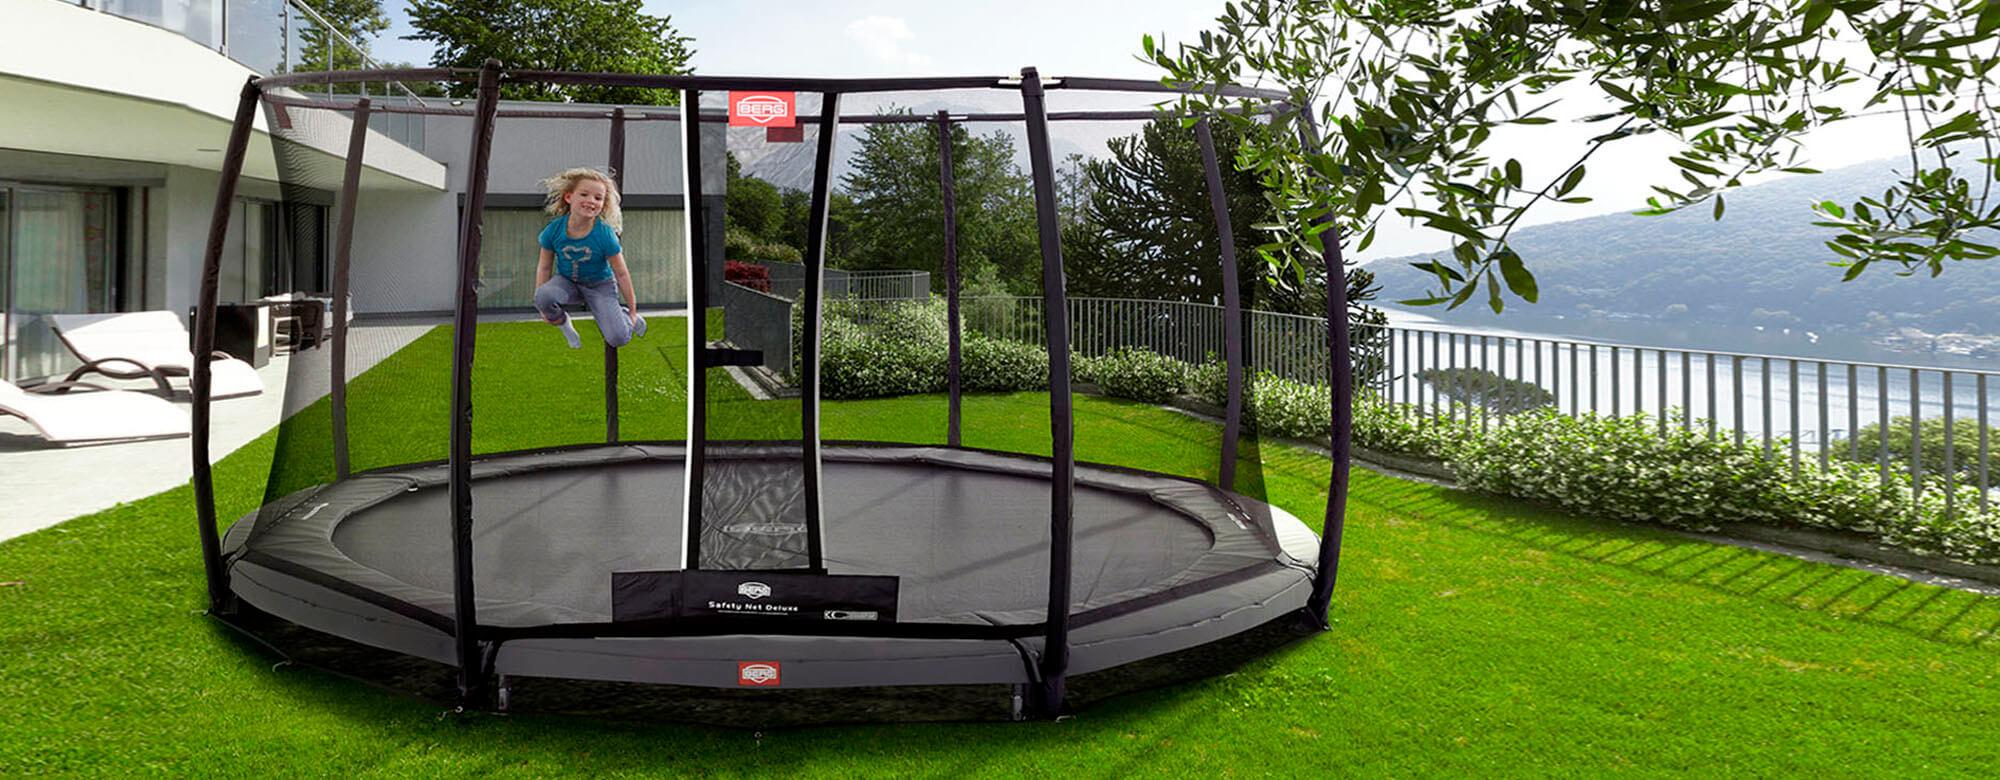 berg trampolin aufbauanleitung einfach schnell bodentrampolin. Black Bedroom Furniture Sets. Home Design Ideas